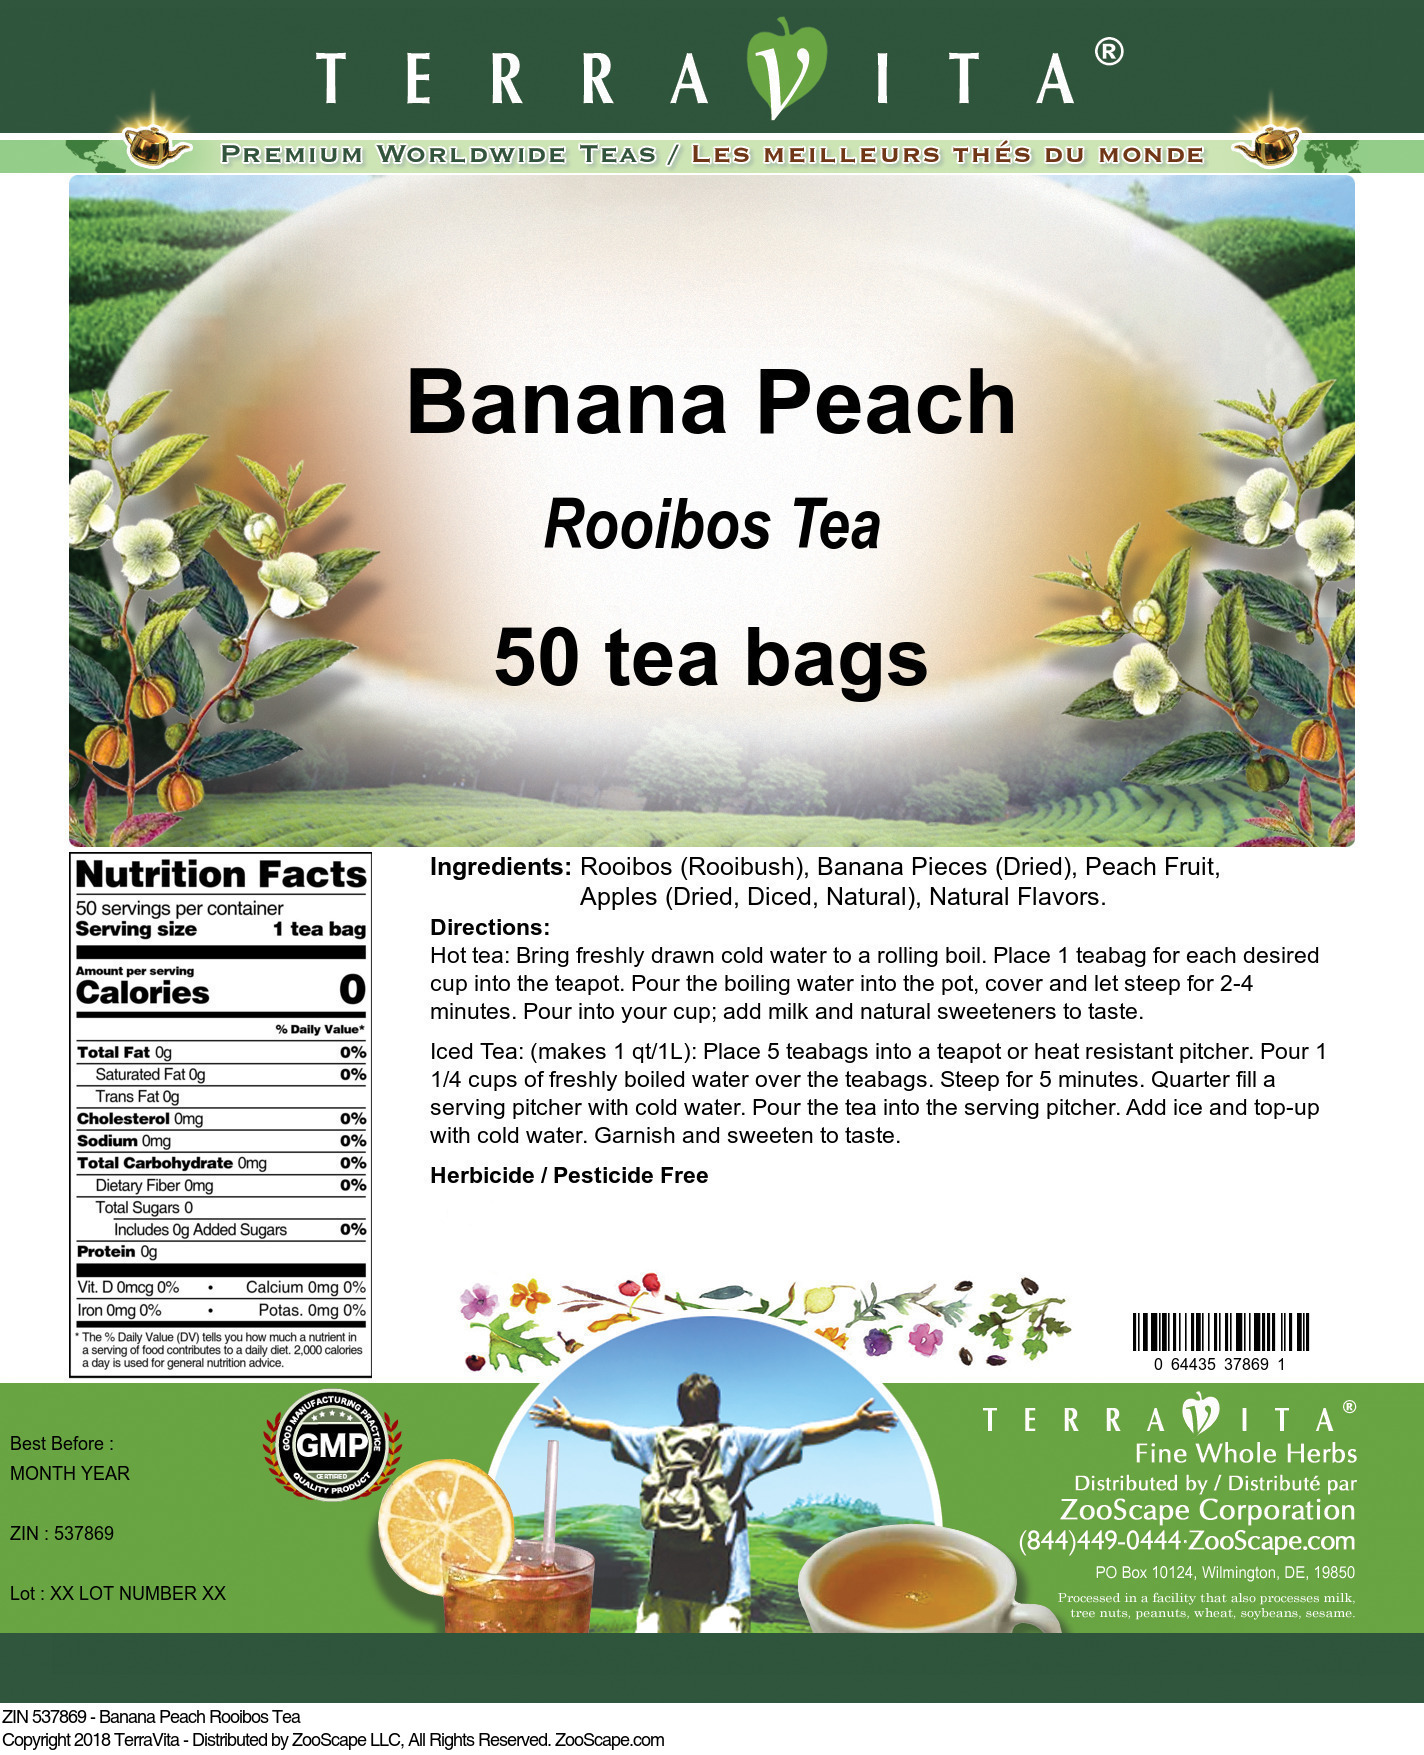 Banana Peach Rooibos Tea